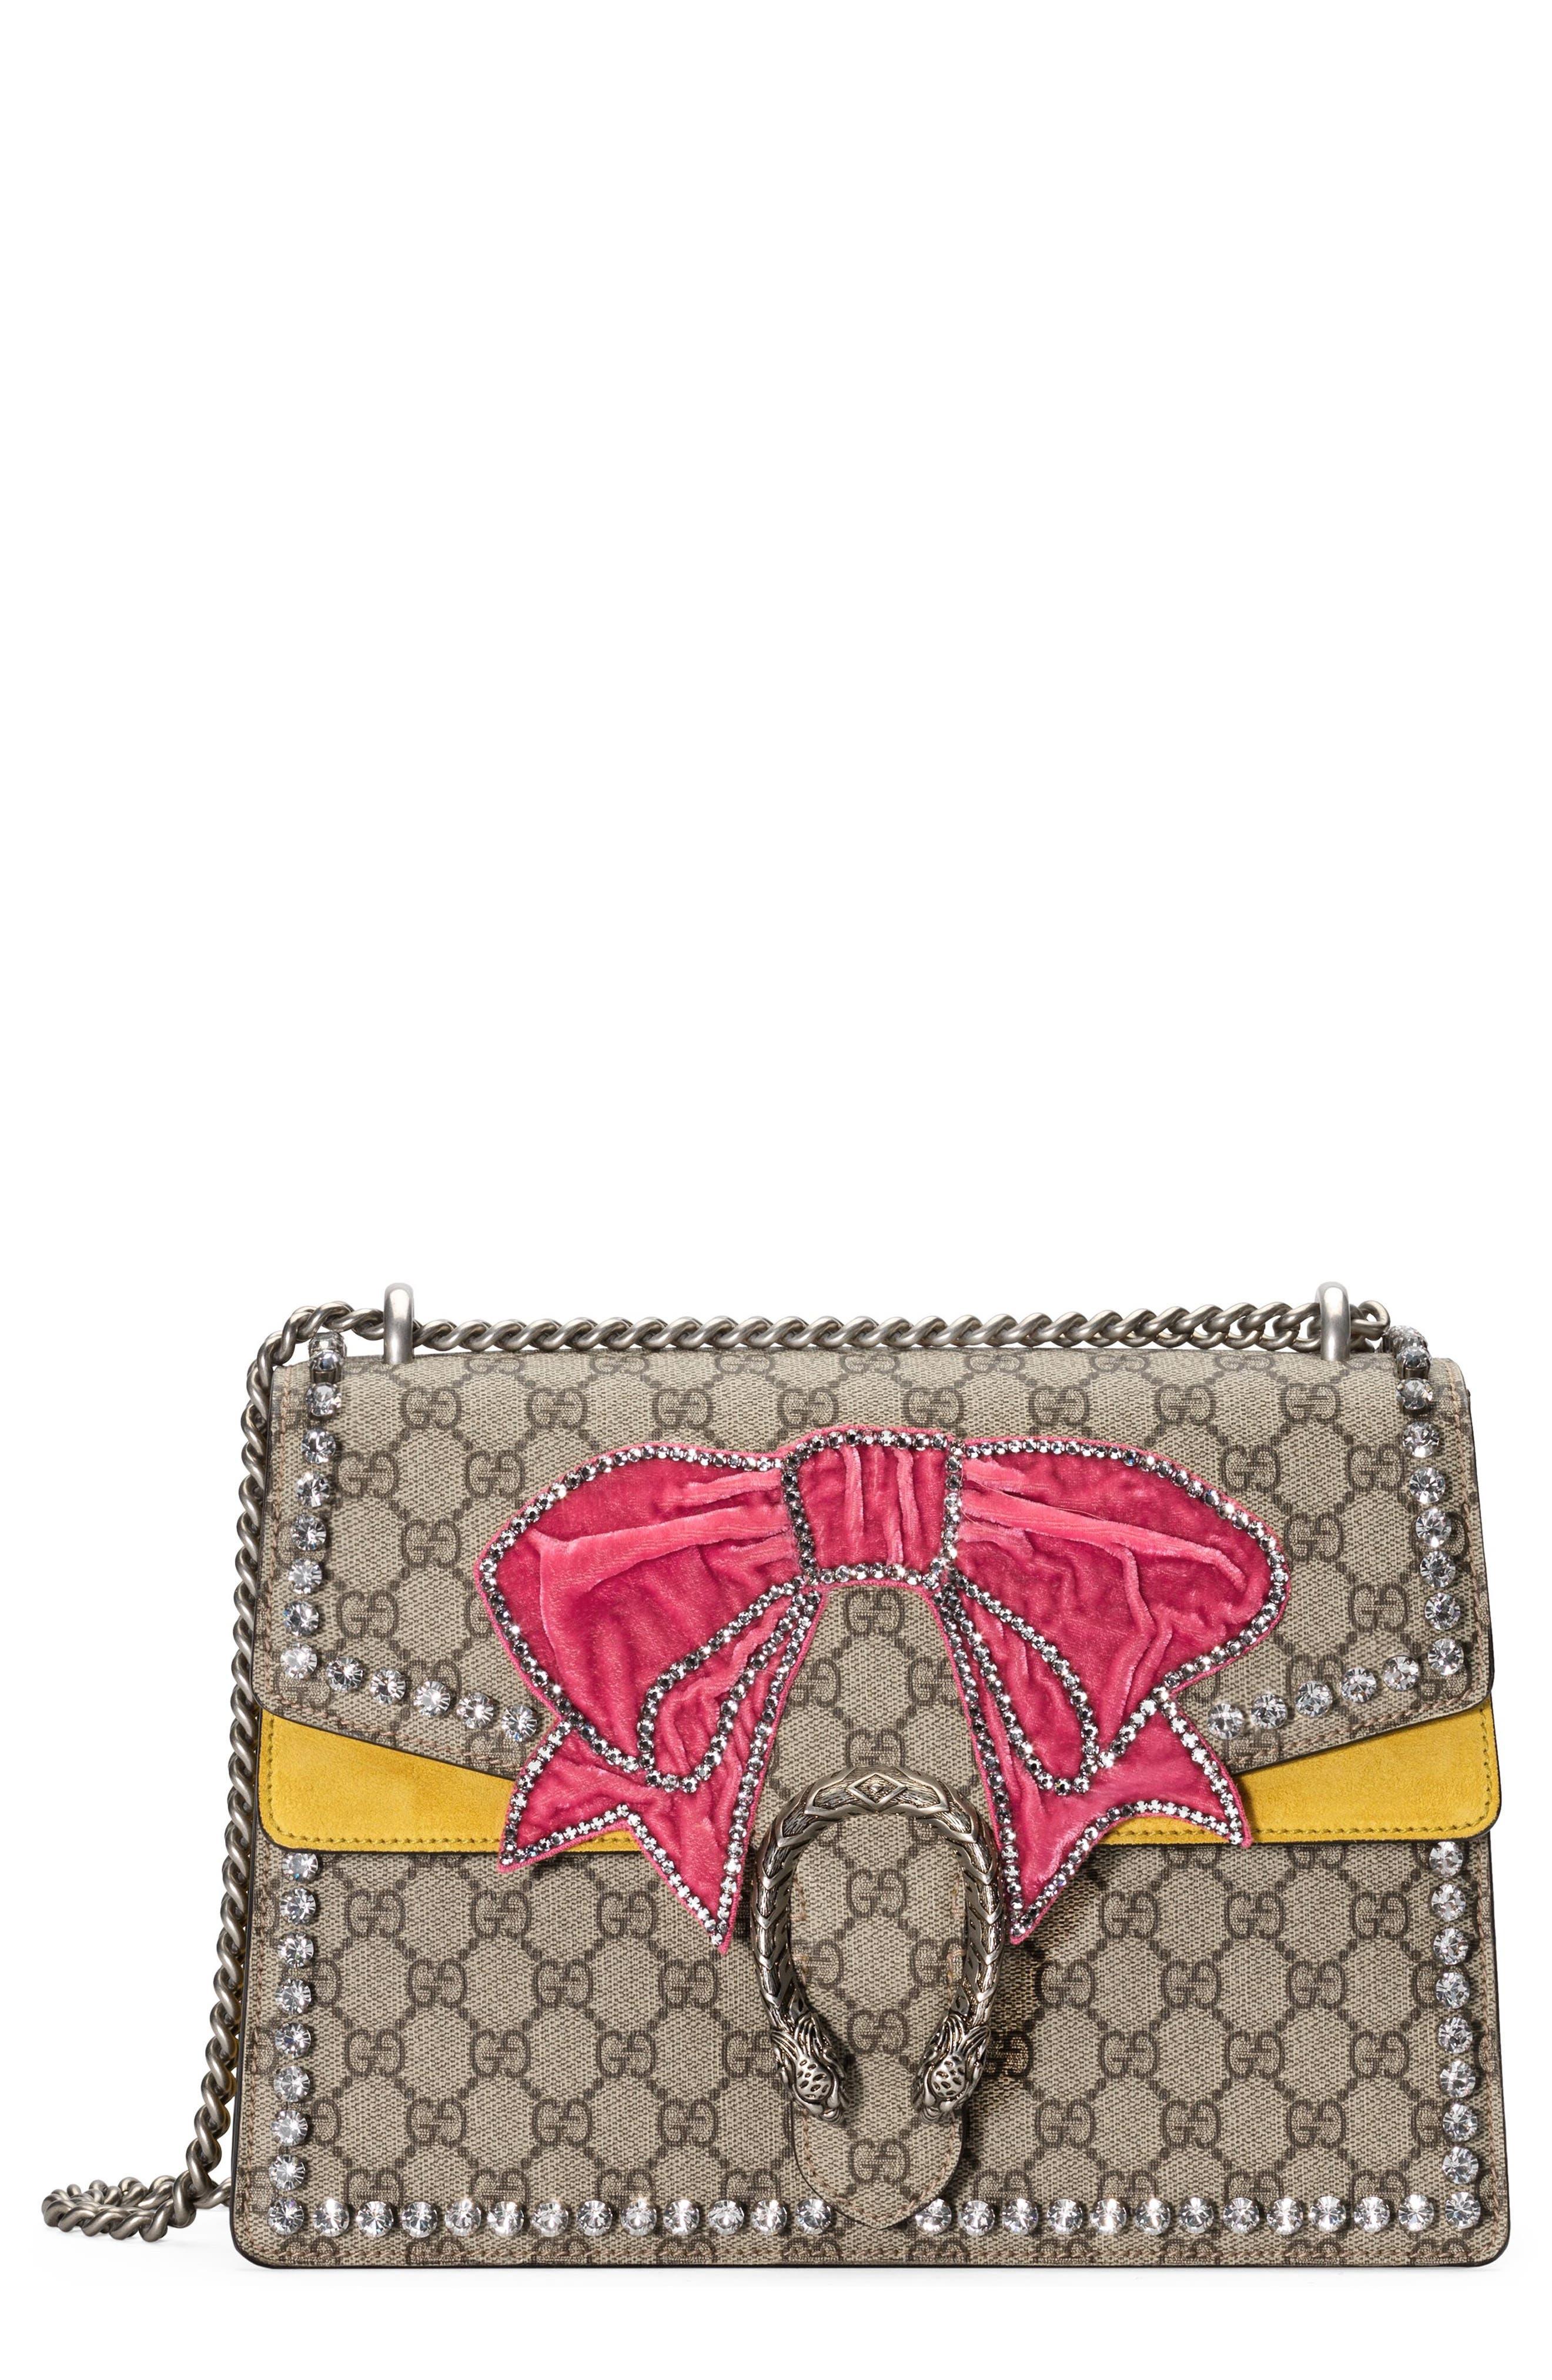 Medium Dionysus GG Supreme Canvas Shoulder Bag,                         Main,                         color, 250